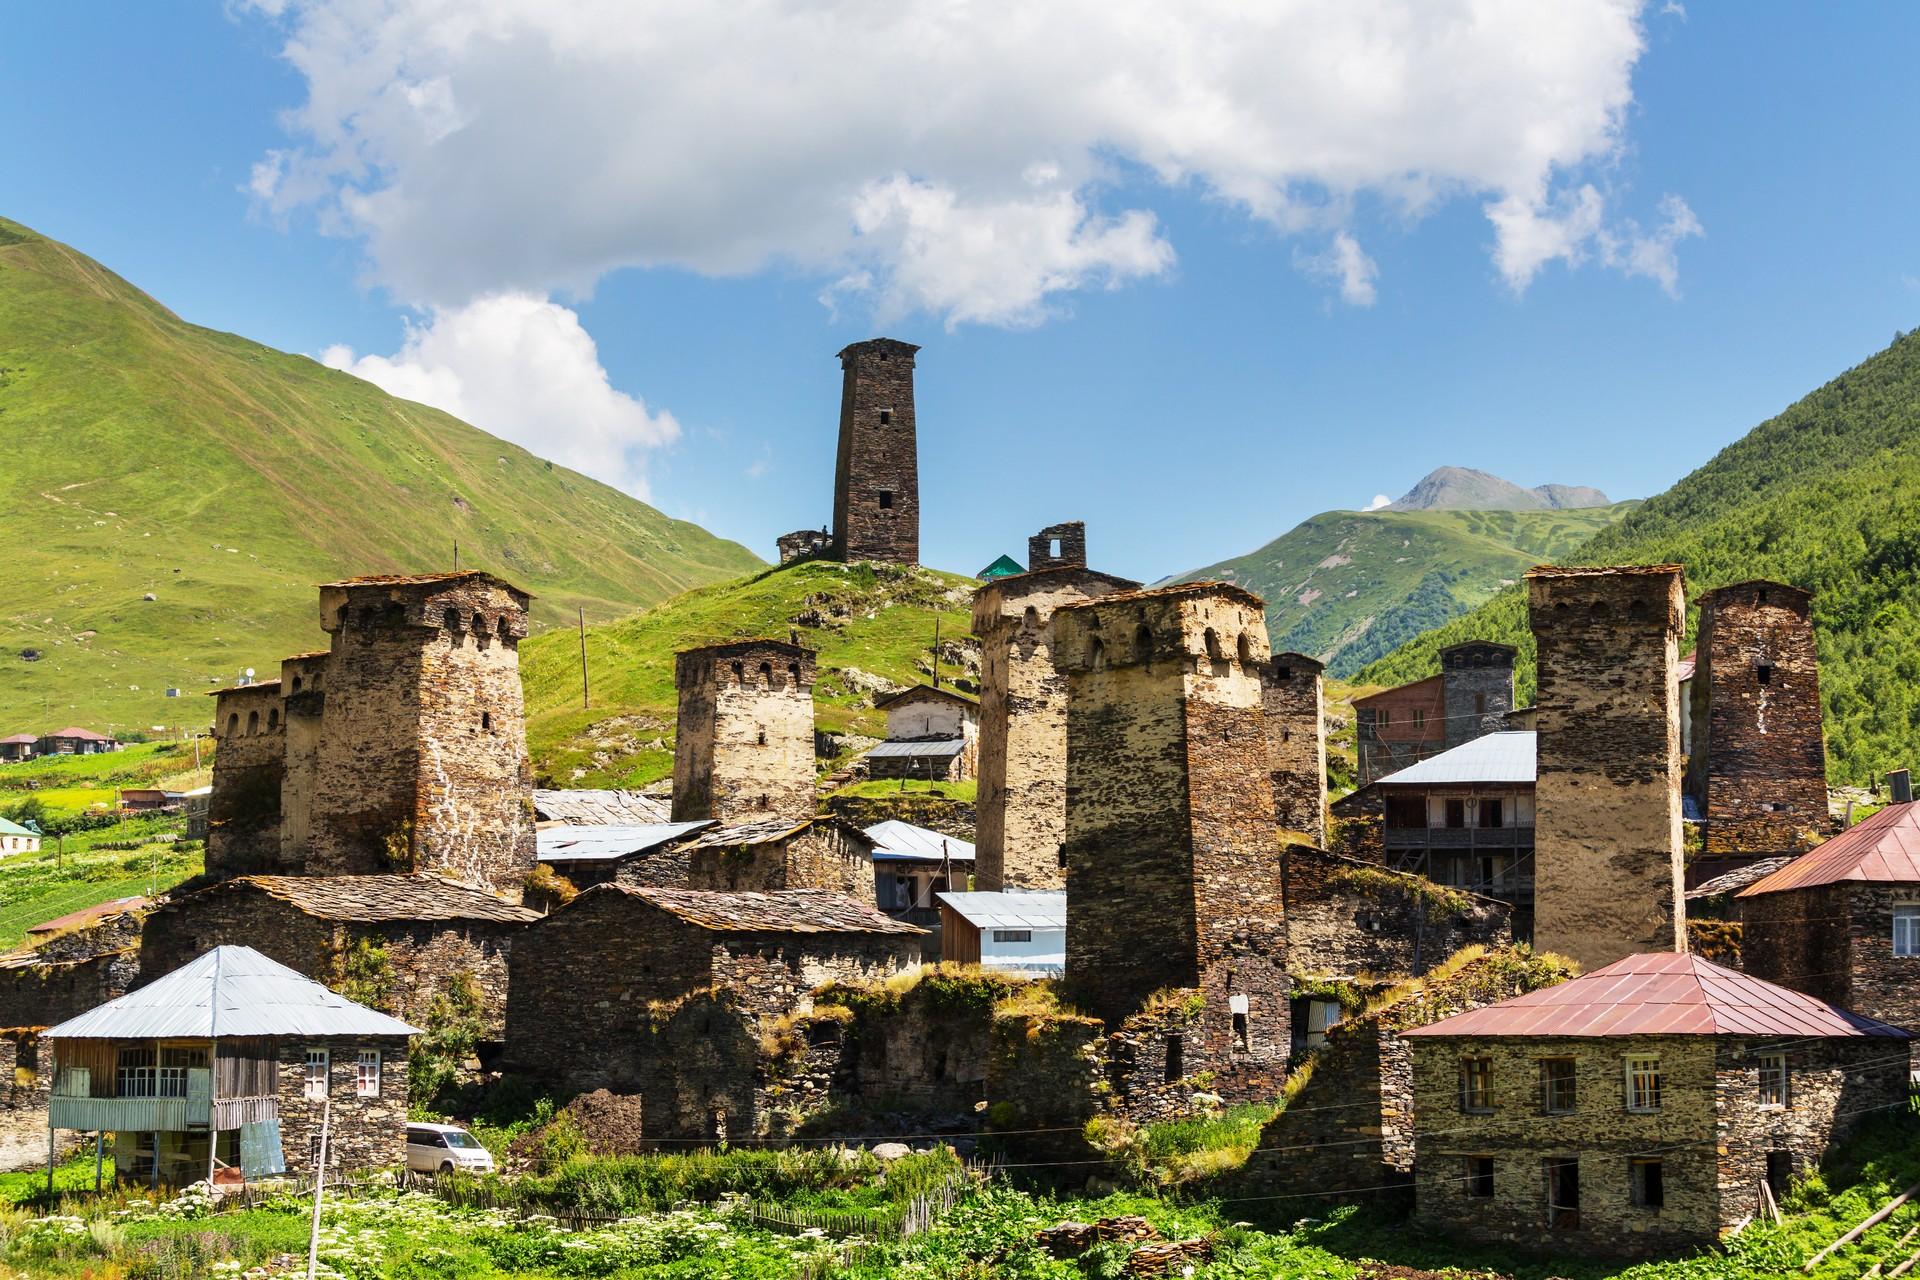 The picturesque village of Ushguli in the Svaneti region of Georgia